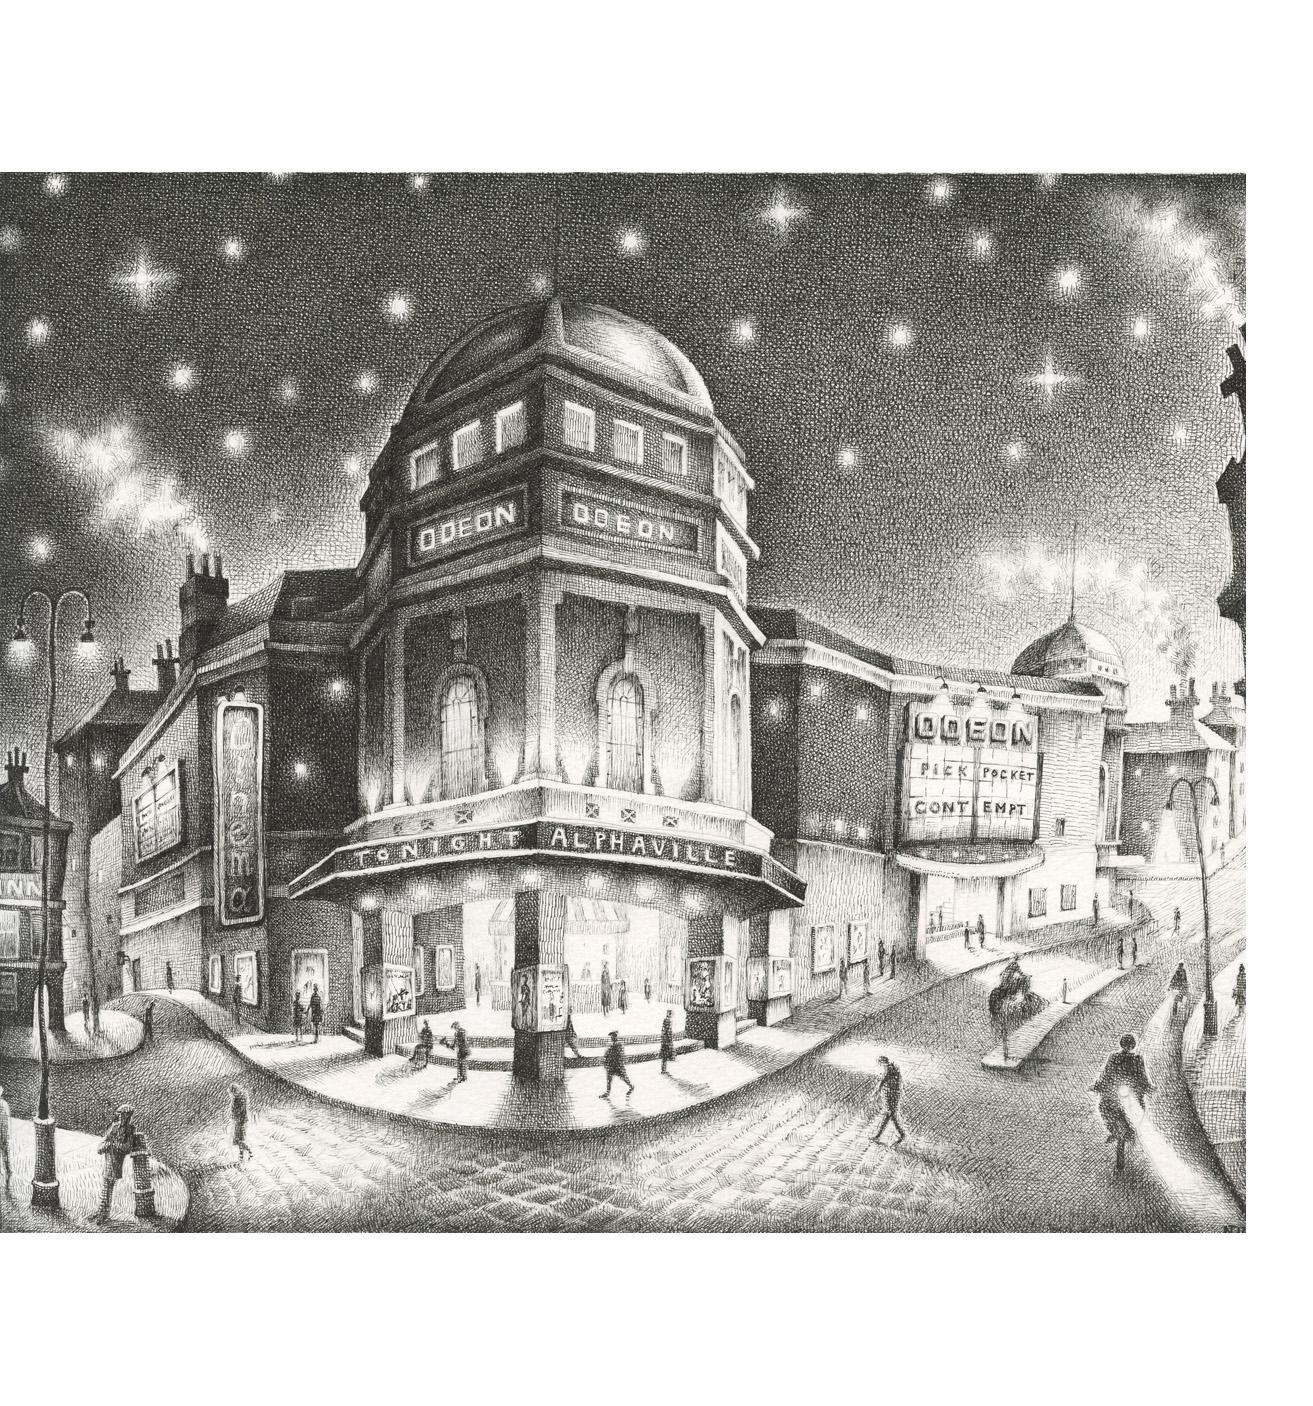 The Odeon, Bradford